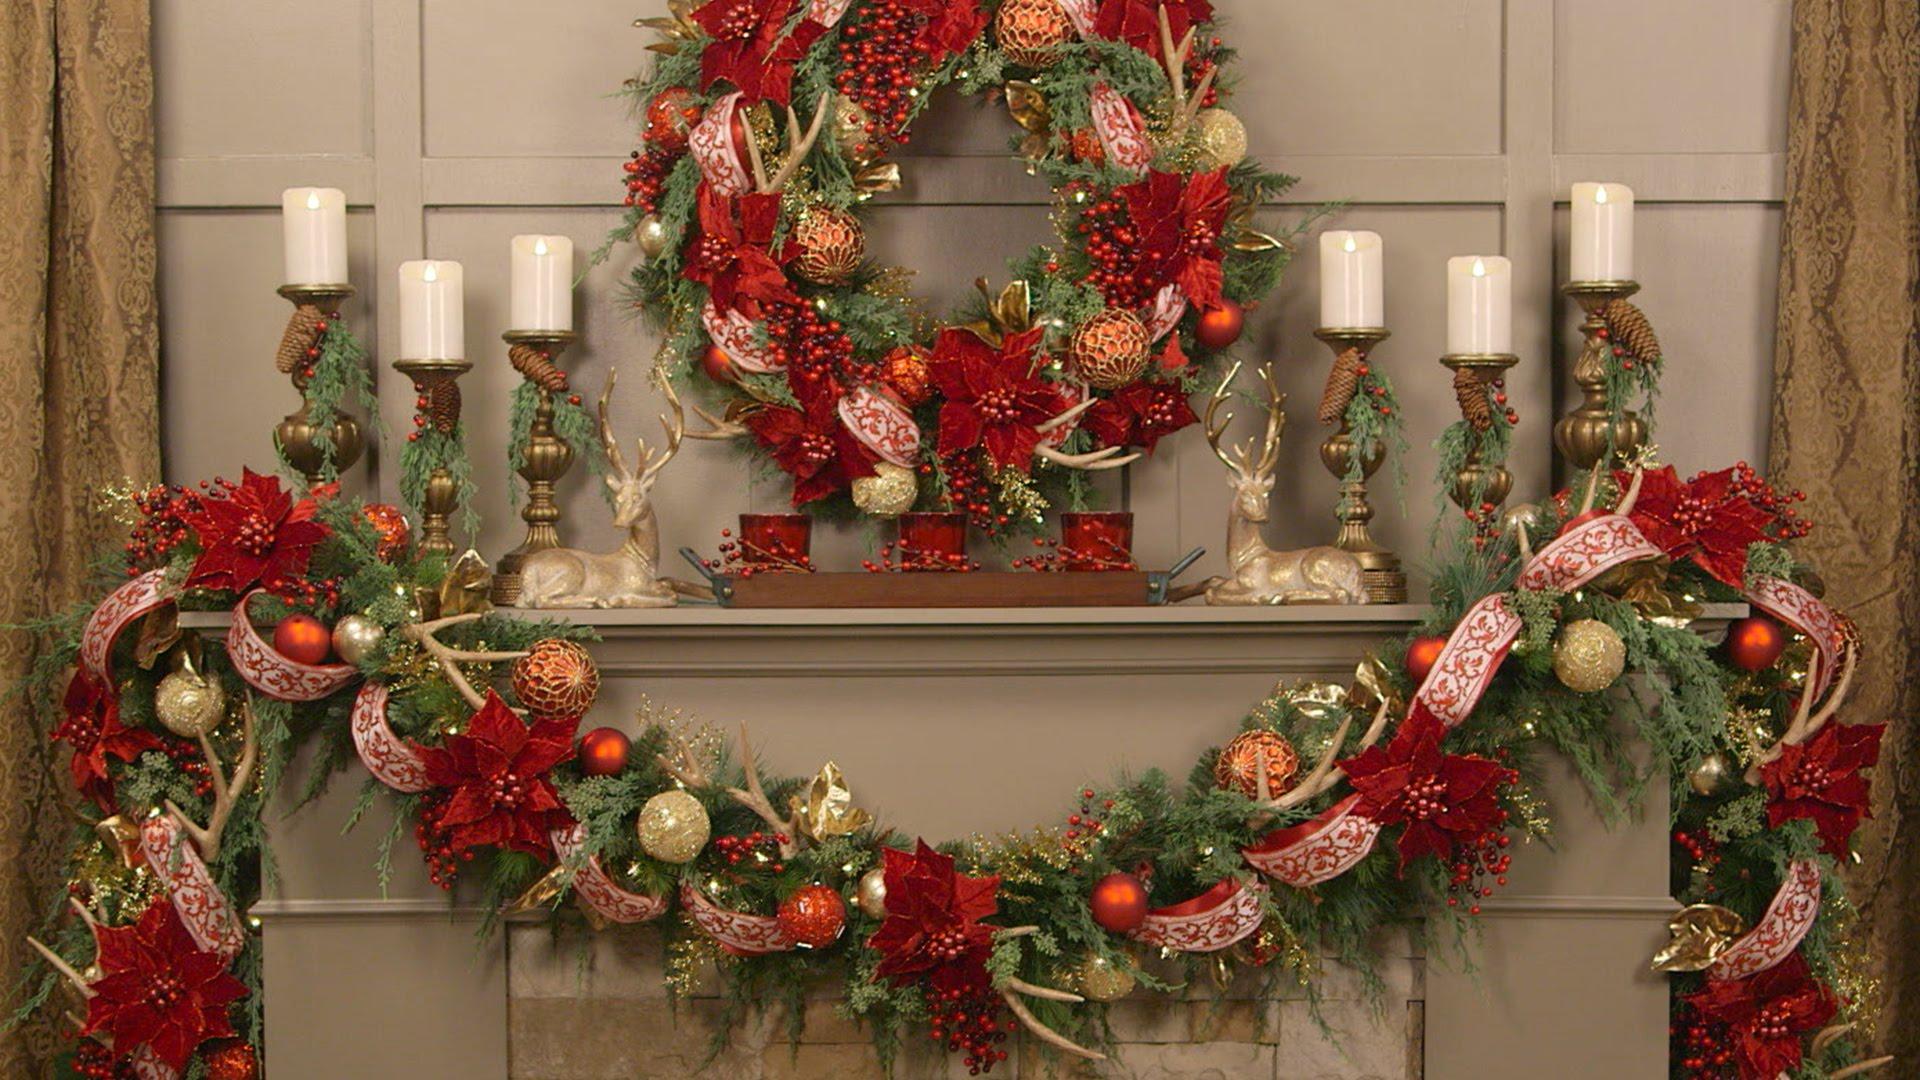 how to enhance home with christmas wall decor printmeposter com blog rh printmeposter com  decorated christmas garlands with lights